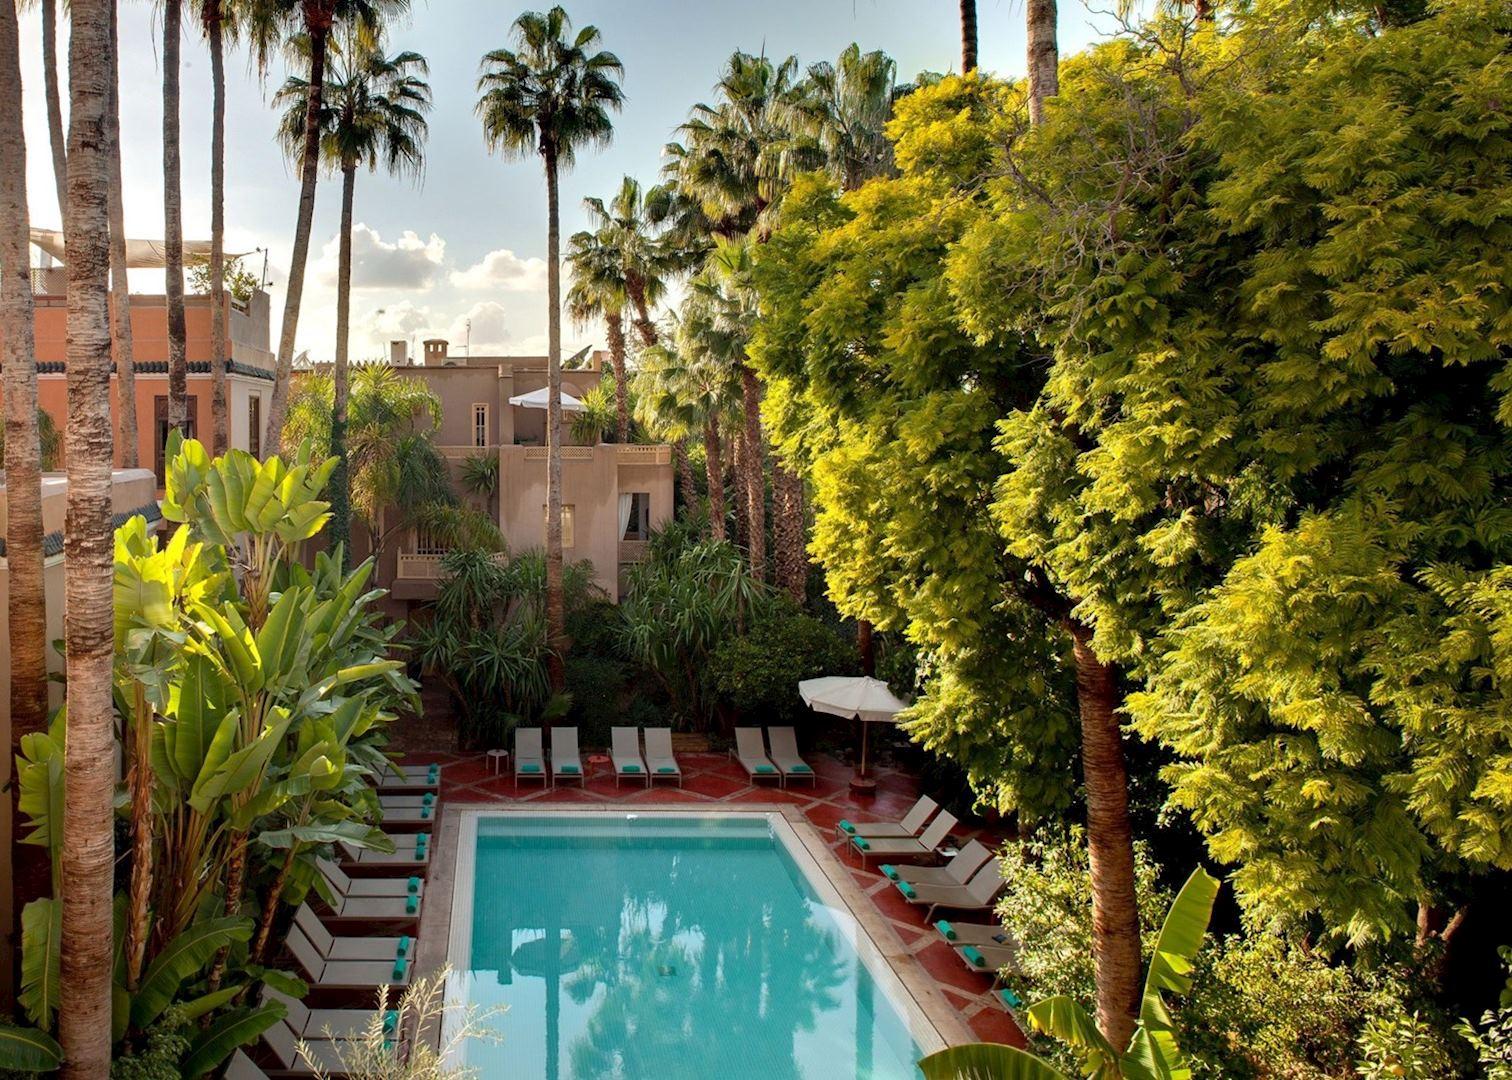 les jardins de la medina marrakesh hotels audley travel. Black Bedroom Furniture Sets. Home Design Ideas